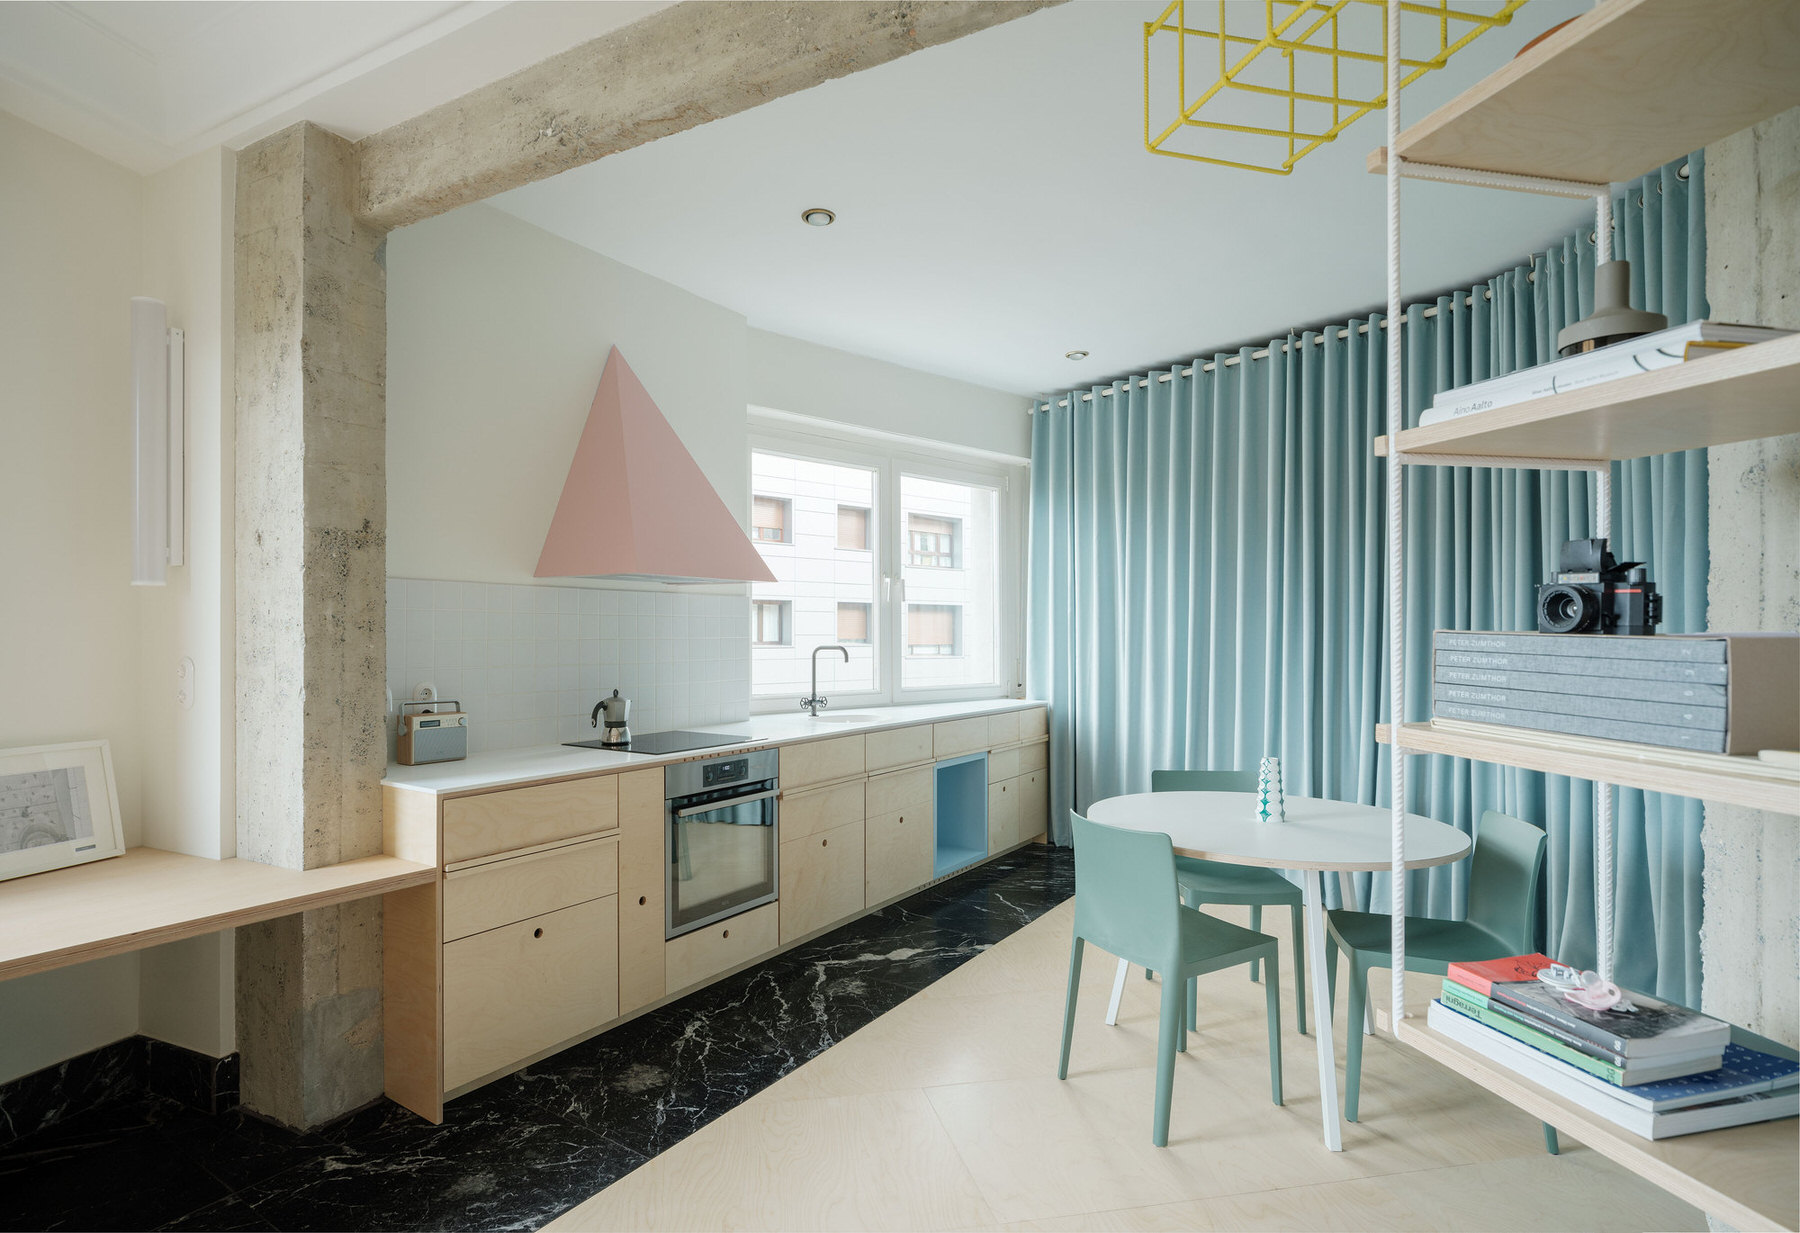 Ready Made Home in Bilbao, Apartment Renovation, Azab, Photo Luis Diaz Diaz | Yellowtrace